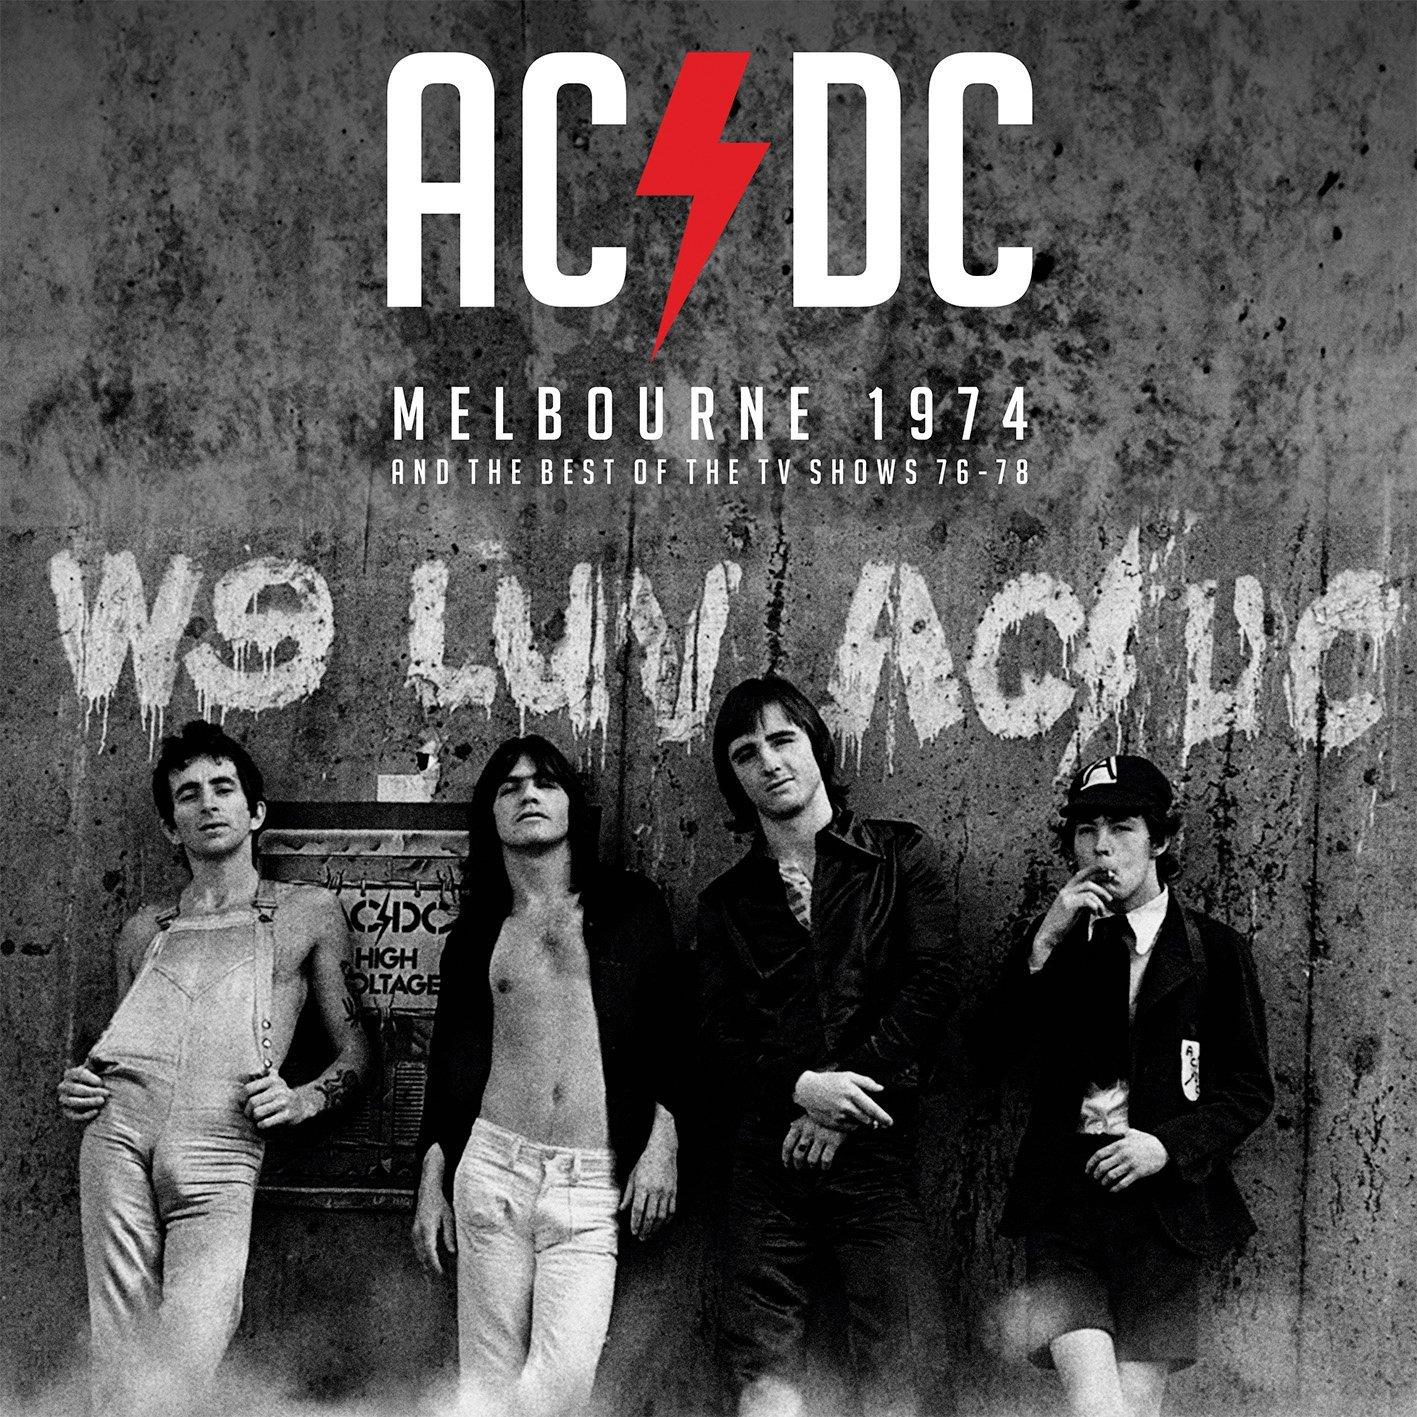 Виниловая пластинка AC/DC - MELBOURNE 1974 & THE TV COLLECTION (2LP)